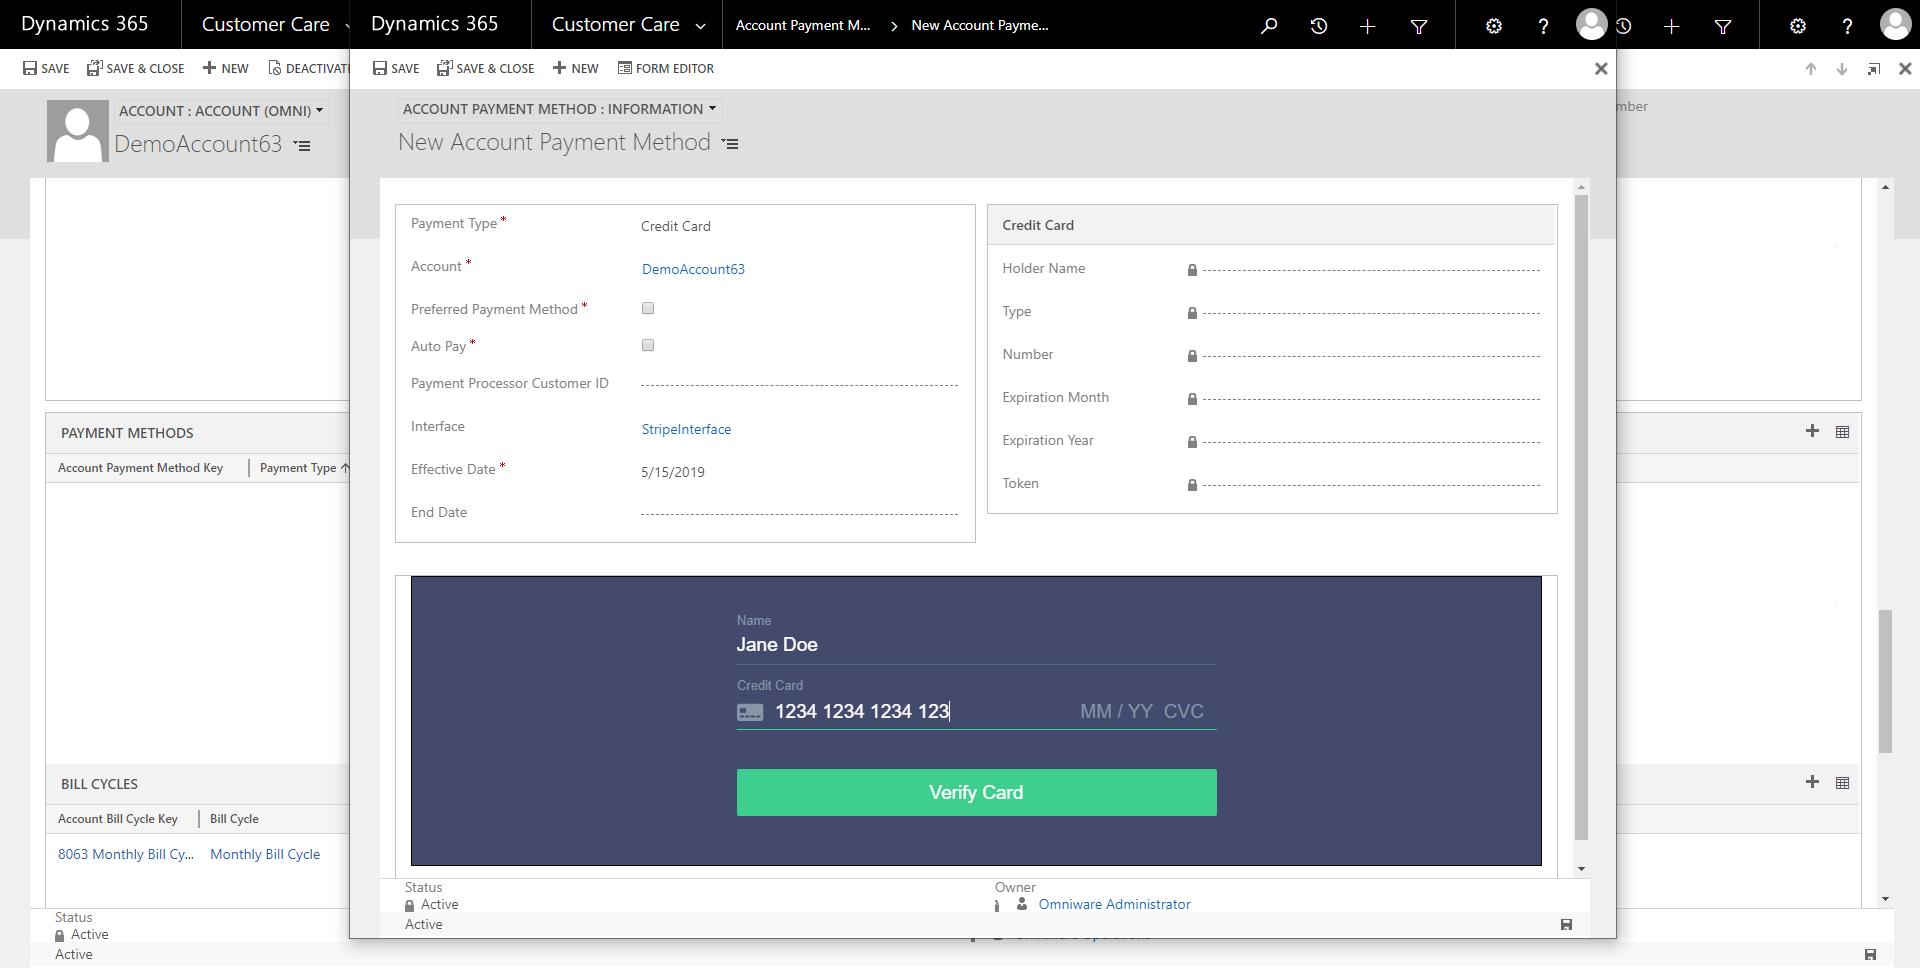 Adding account payment method